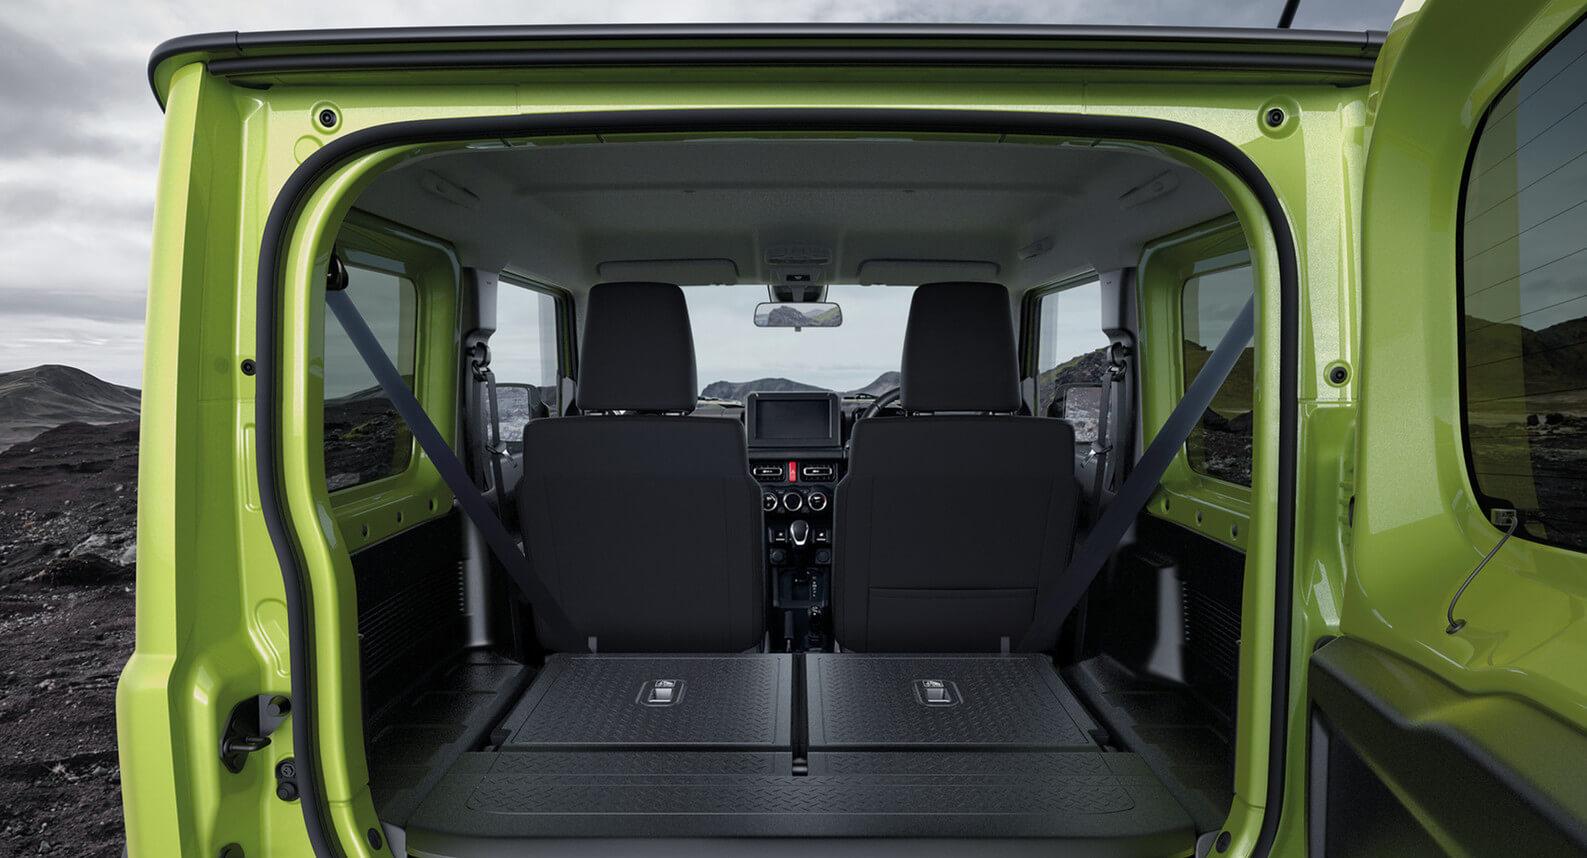 Practical rear storage